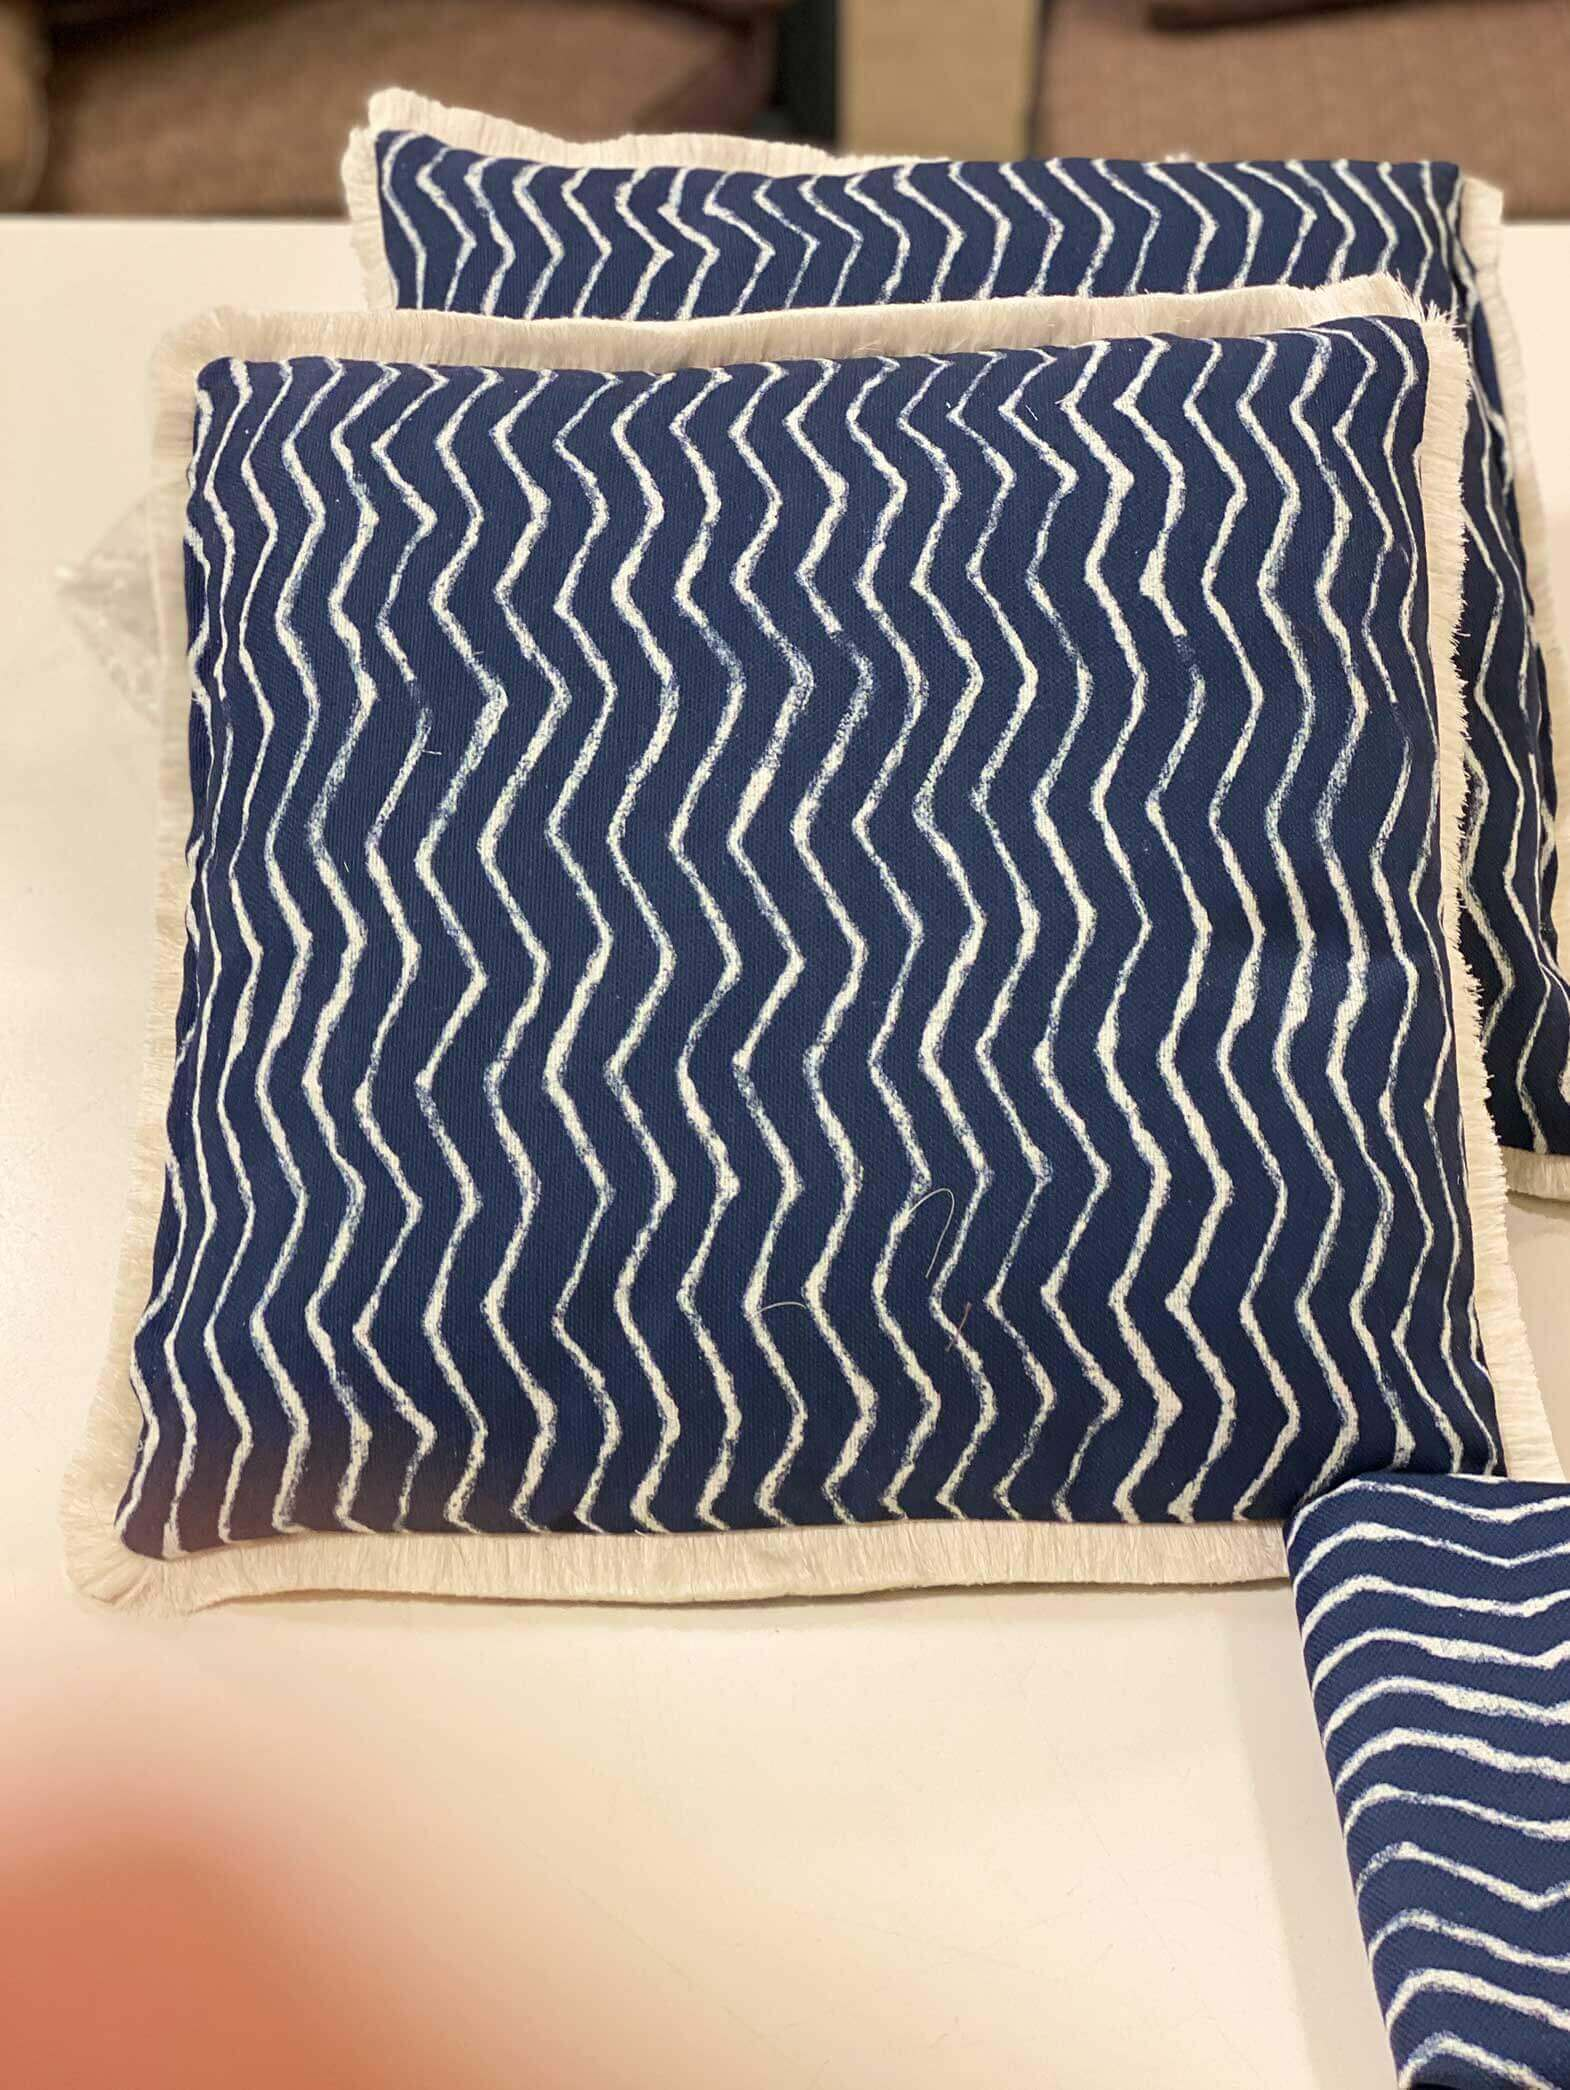 19-square-pillows-brush-fringe2